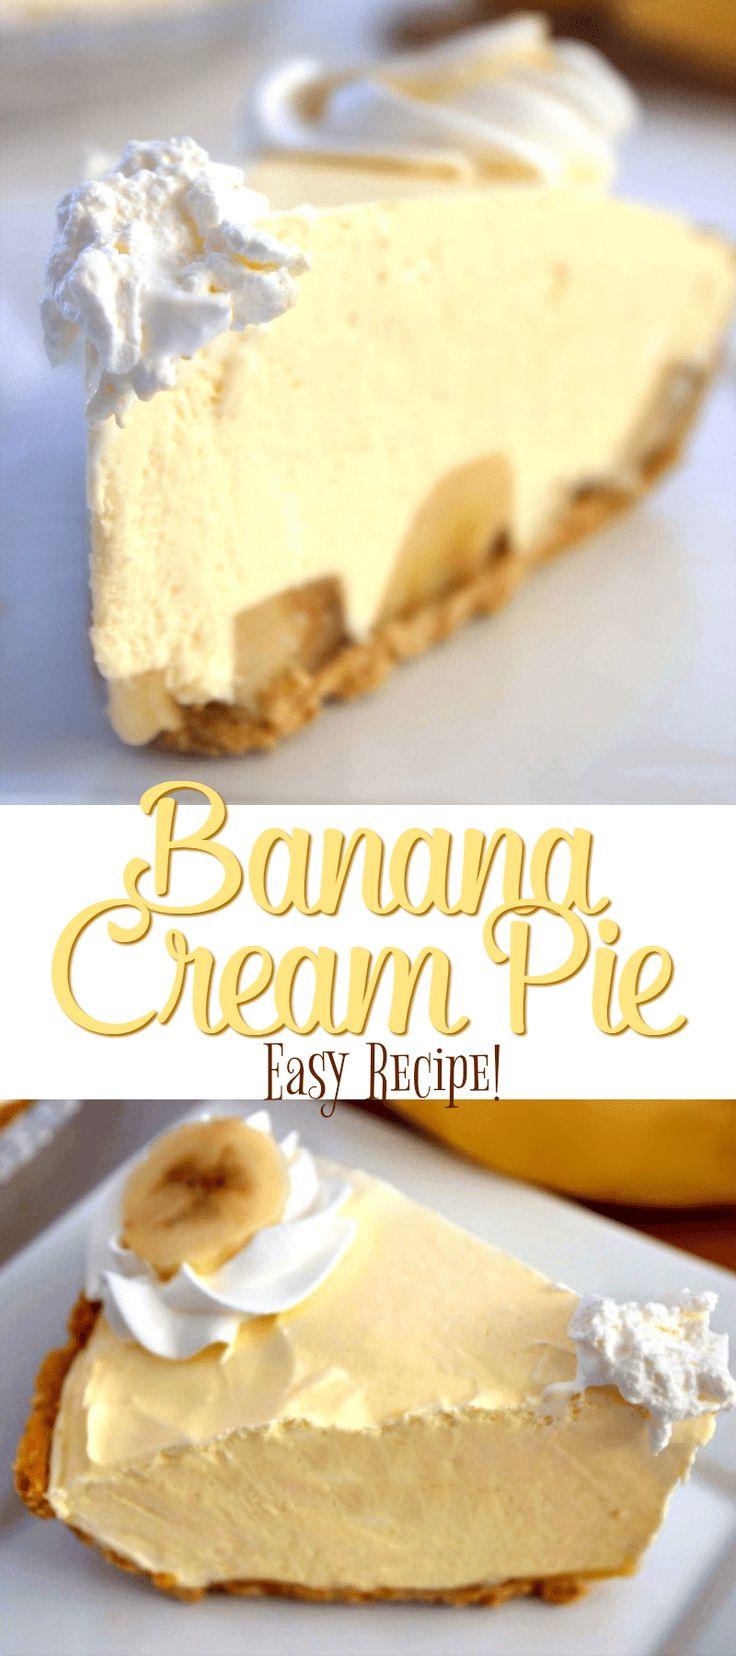 Easy Banana Cream Pie Recipe - The best and easiest Banana Cream Pie ever!